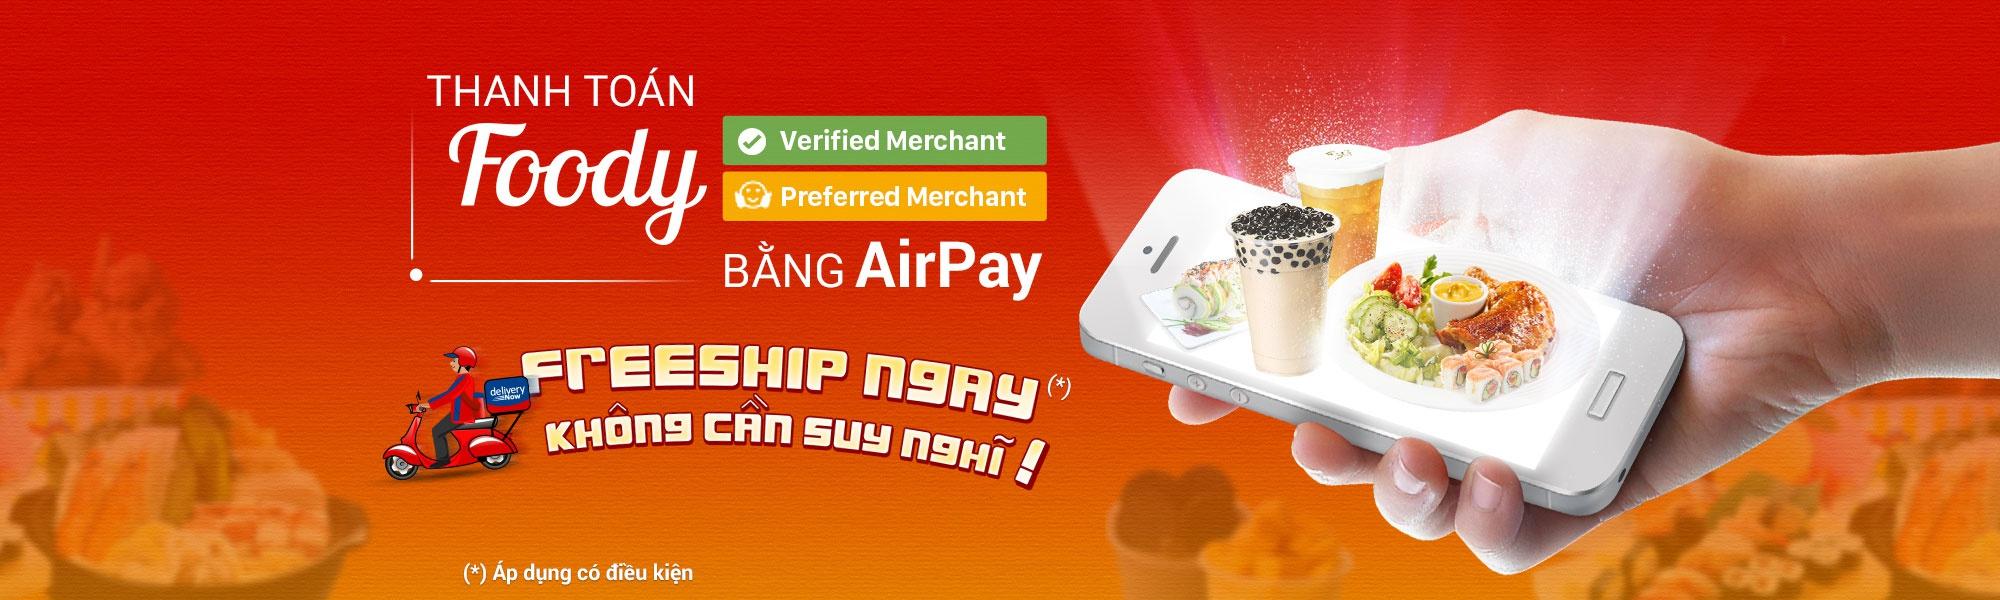 freeship-15k-preferred-merchant-va-verified-merchant